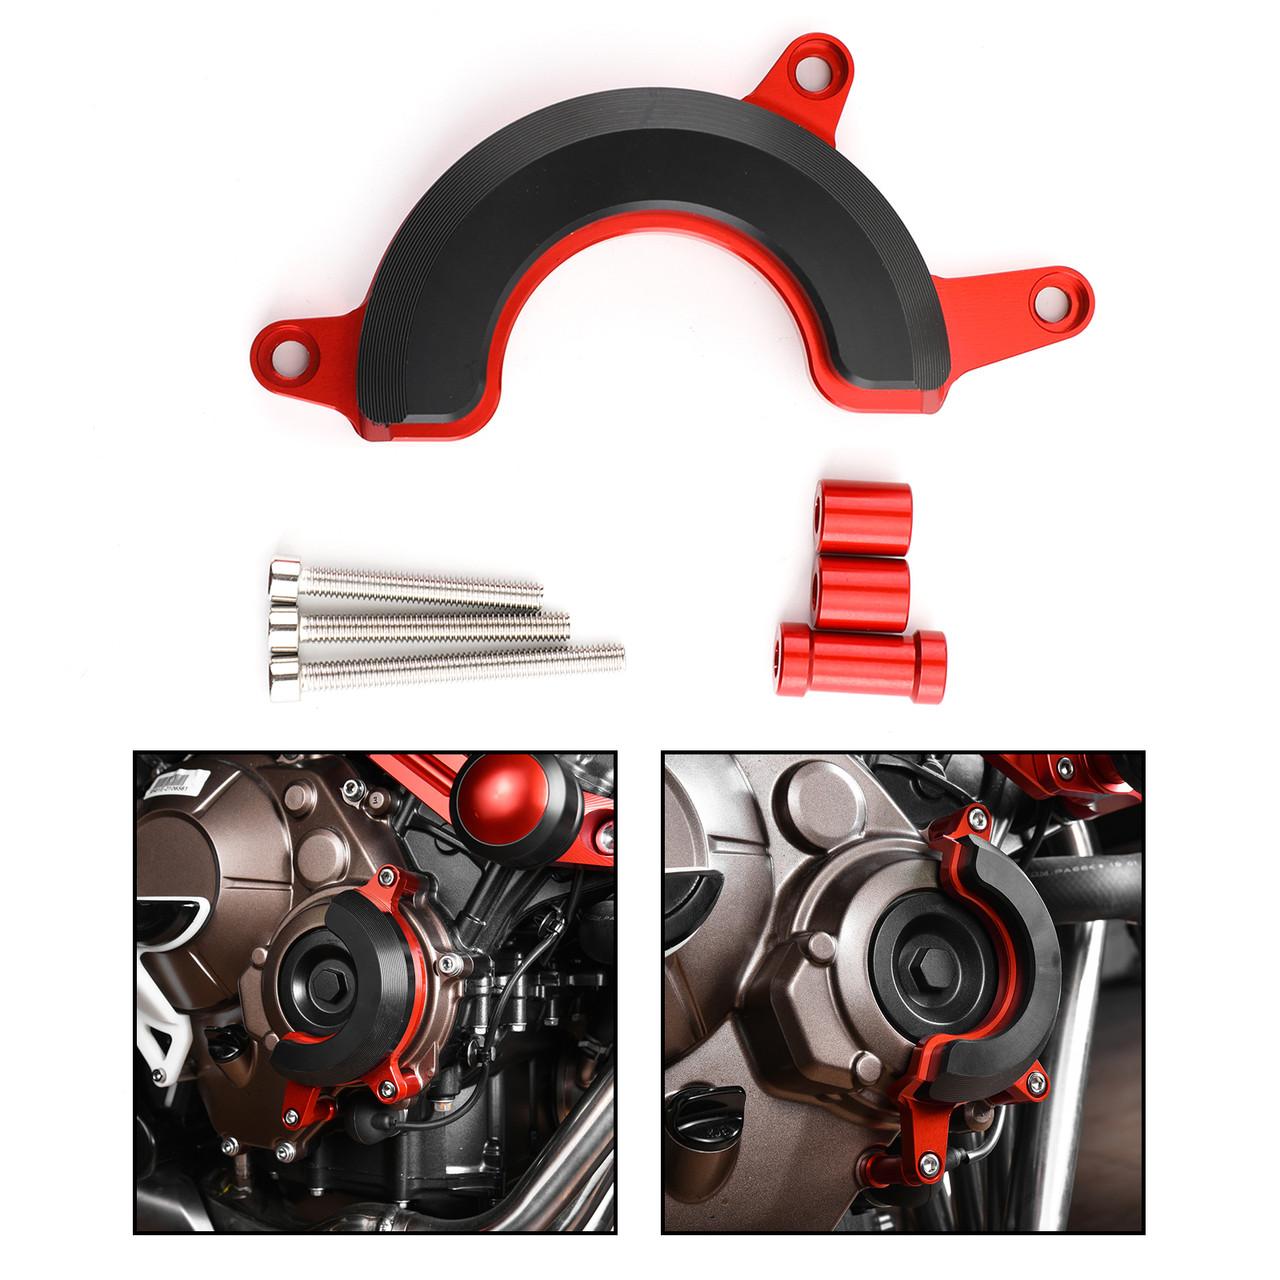 Right Engine Stator Slider Crash Pad Protector for Honda CB650R 19-21 CB650F 14-21 RED